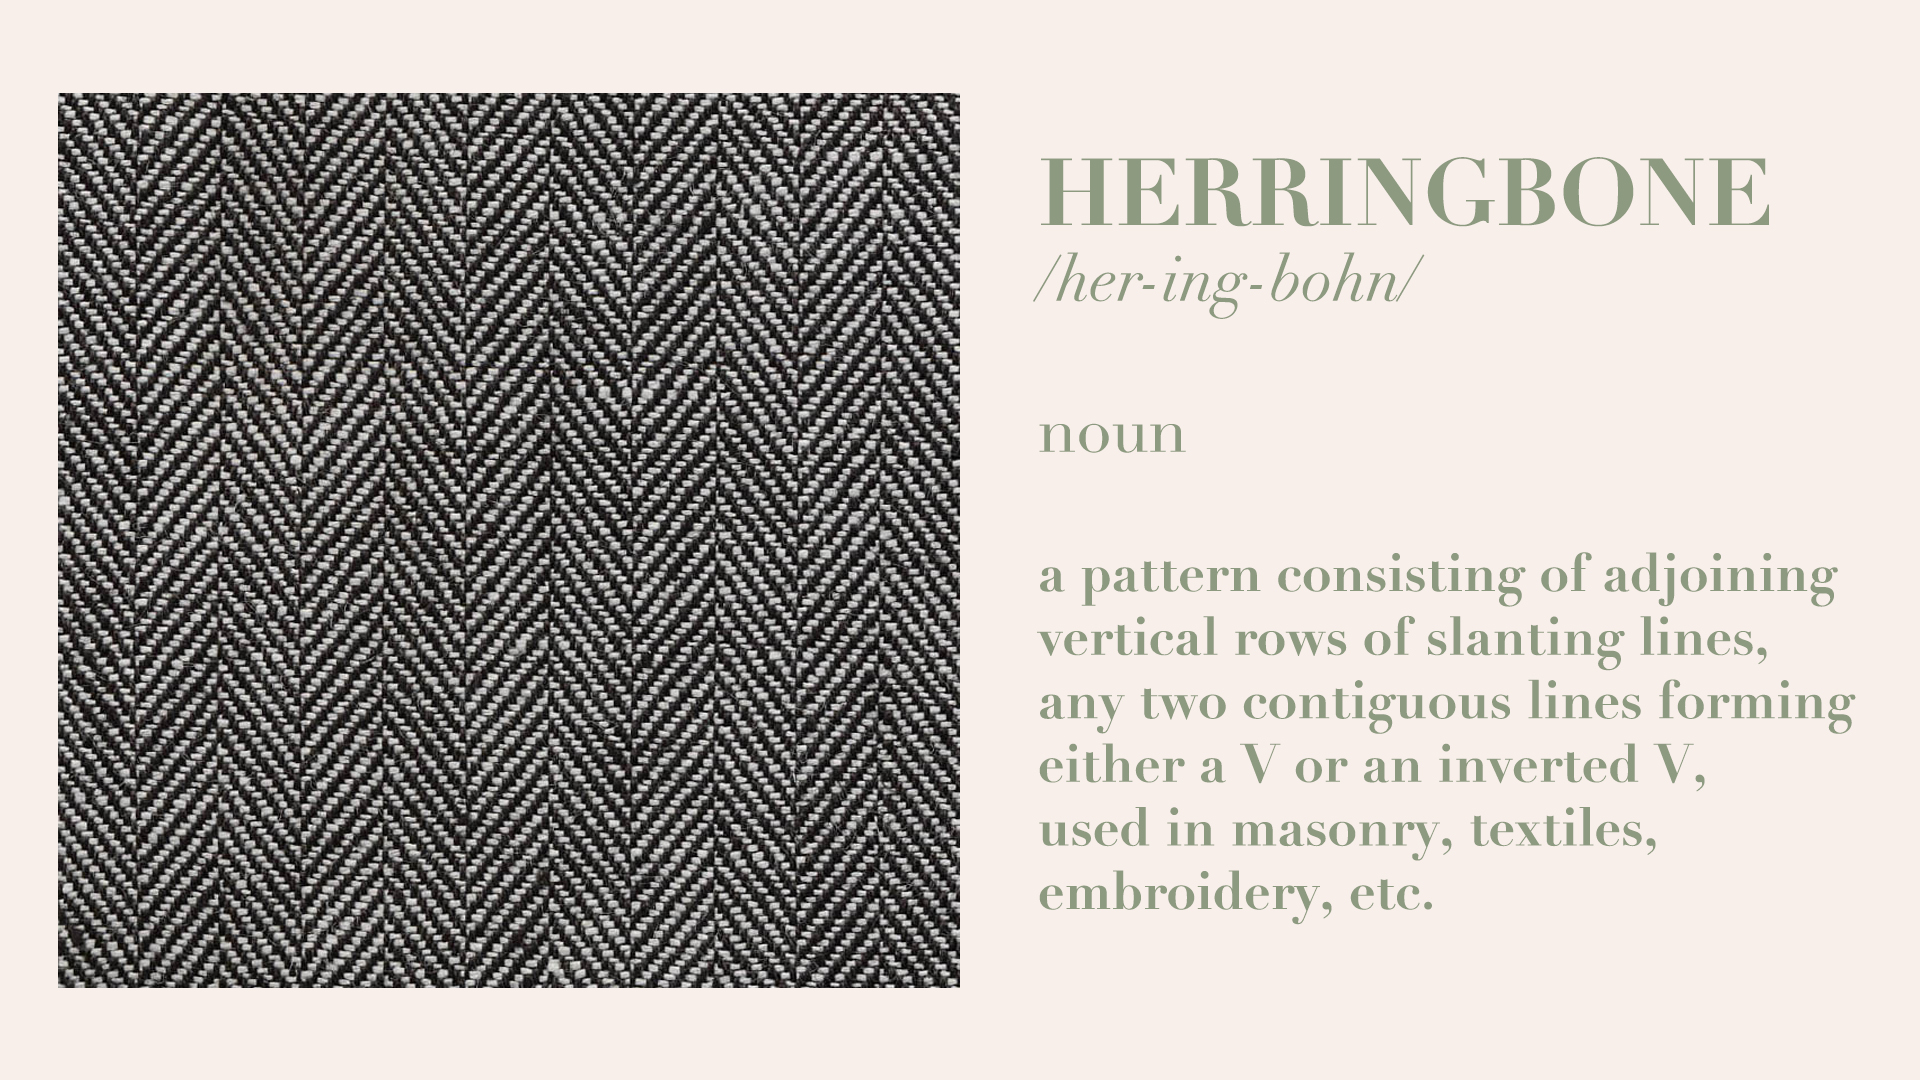 herringbone definition.jpg